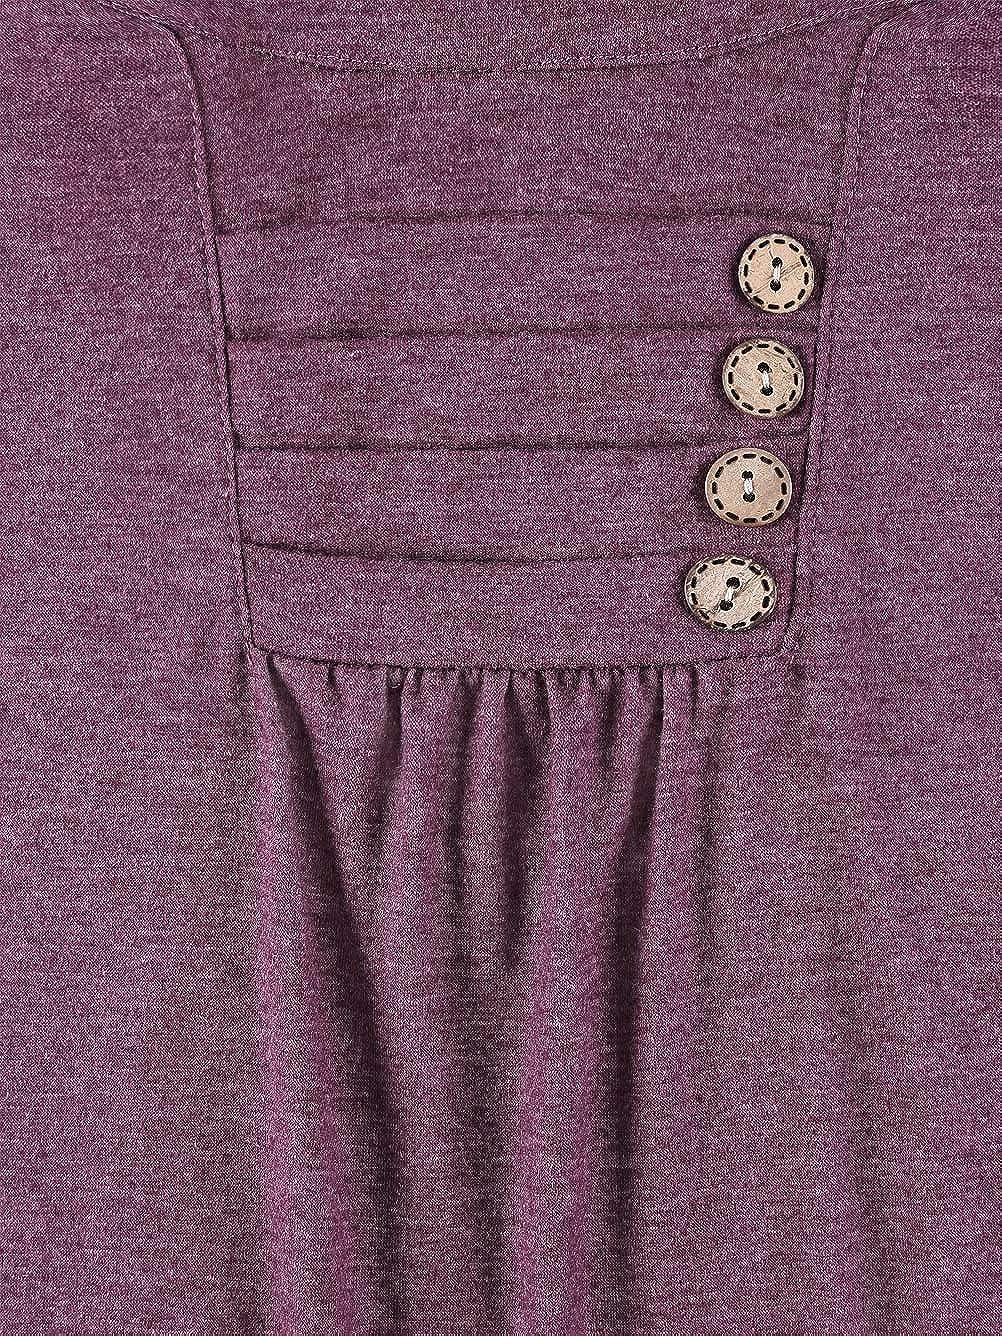 Kaei/&Shi Hooded Cowl Neck Tunic Drawstring Color Block Sweatshirt Hoodies Women Fashion